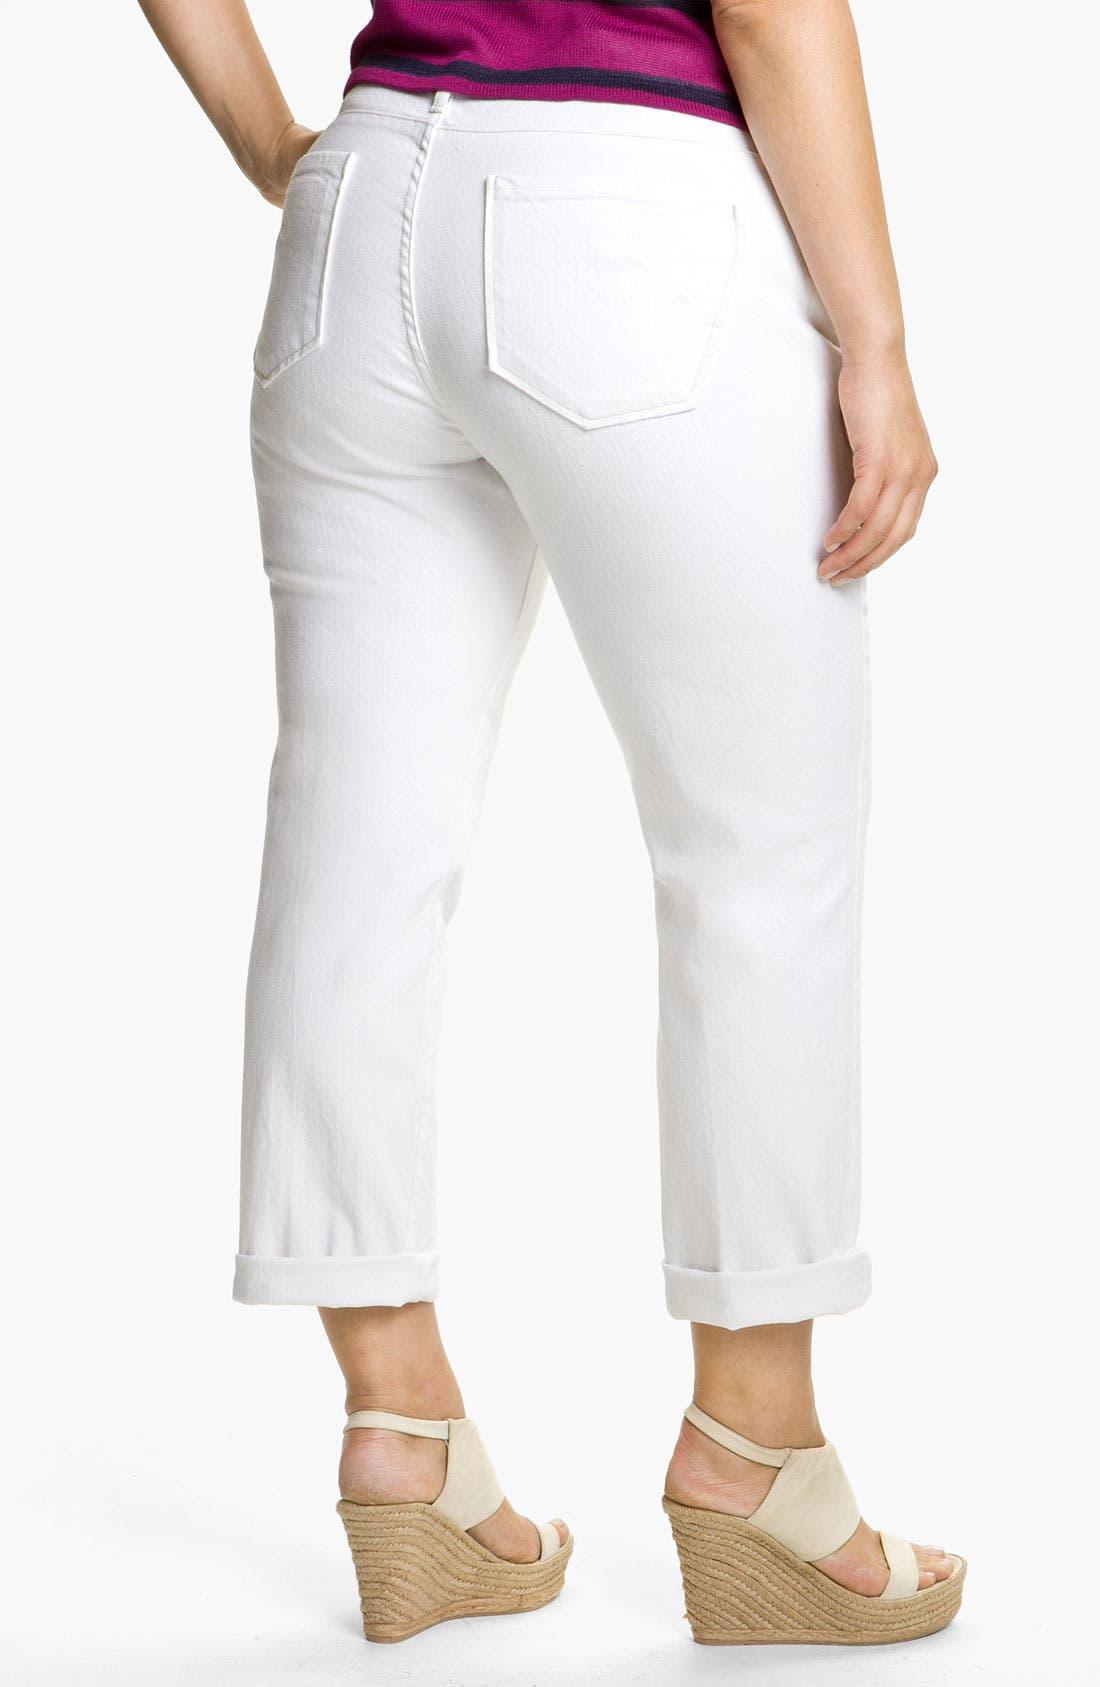 Alternate Image 1 Selected - James Jeans Boyfriend Jeans (Plus)